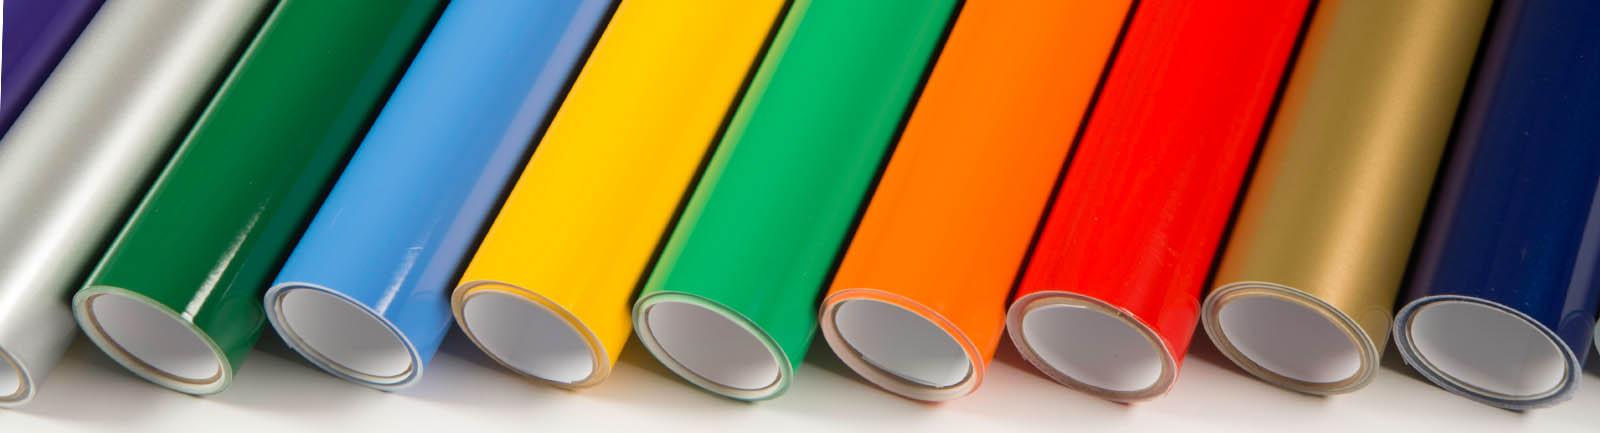 Arrow Systems Inc International Gerber Materials